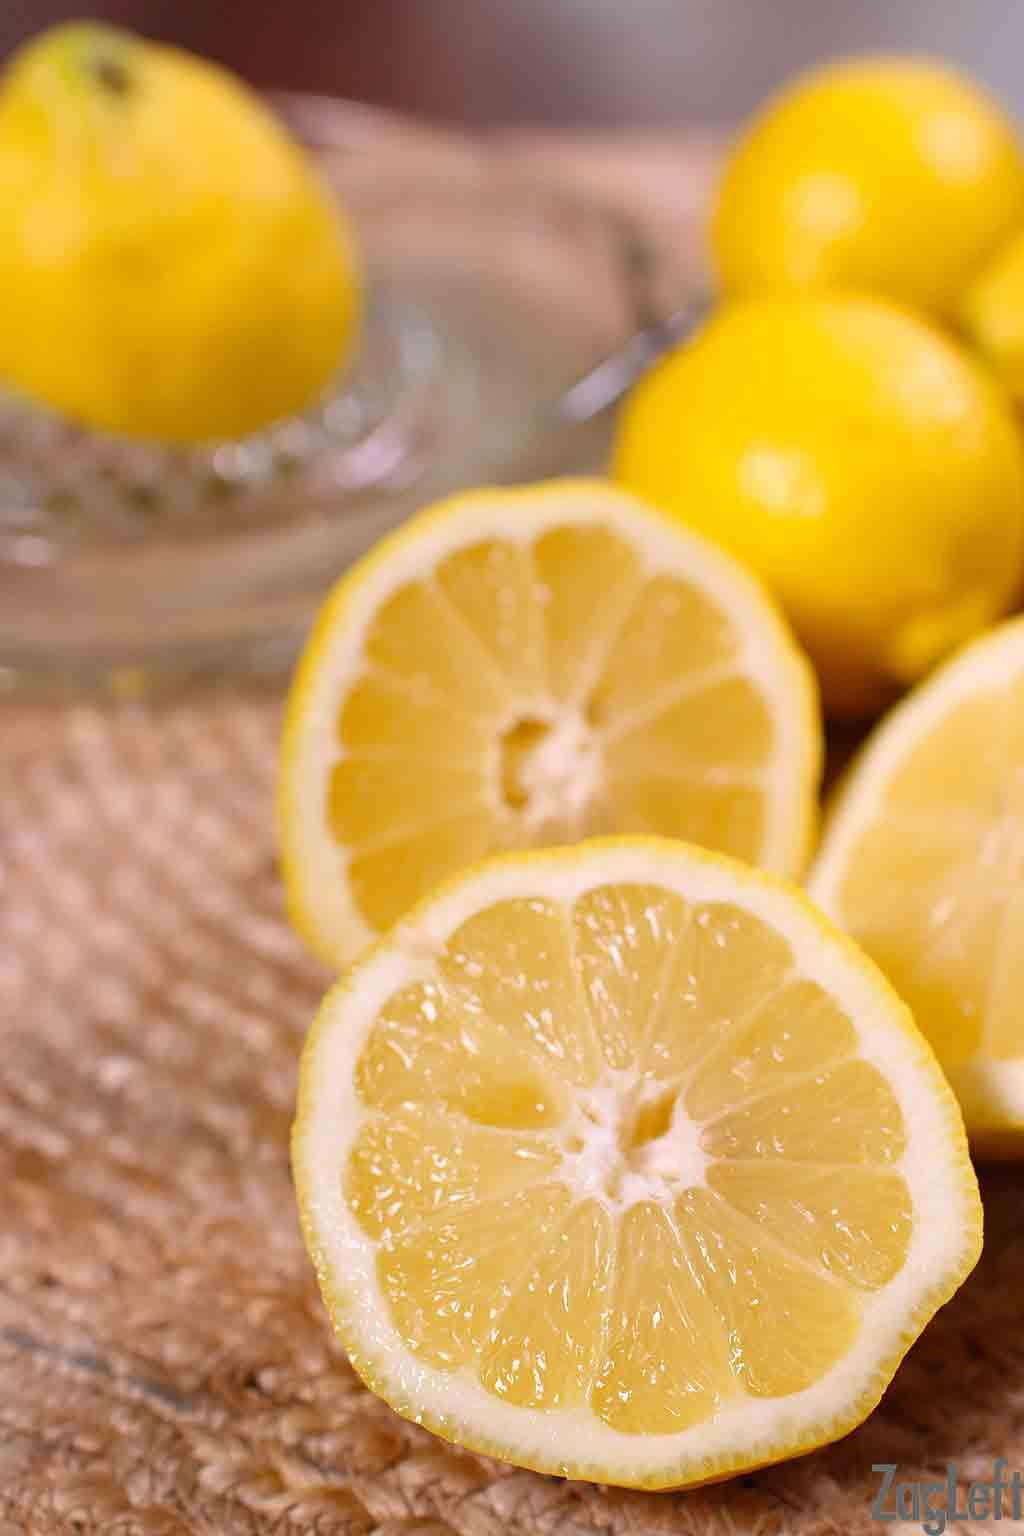 Lemons on a table cut in half